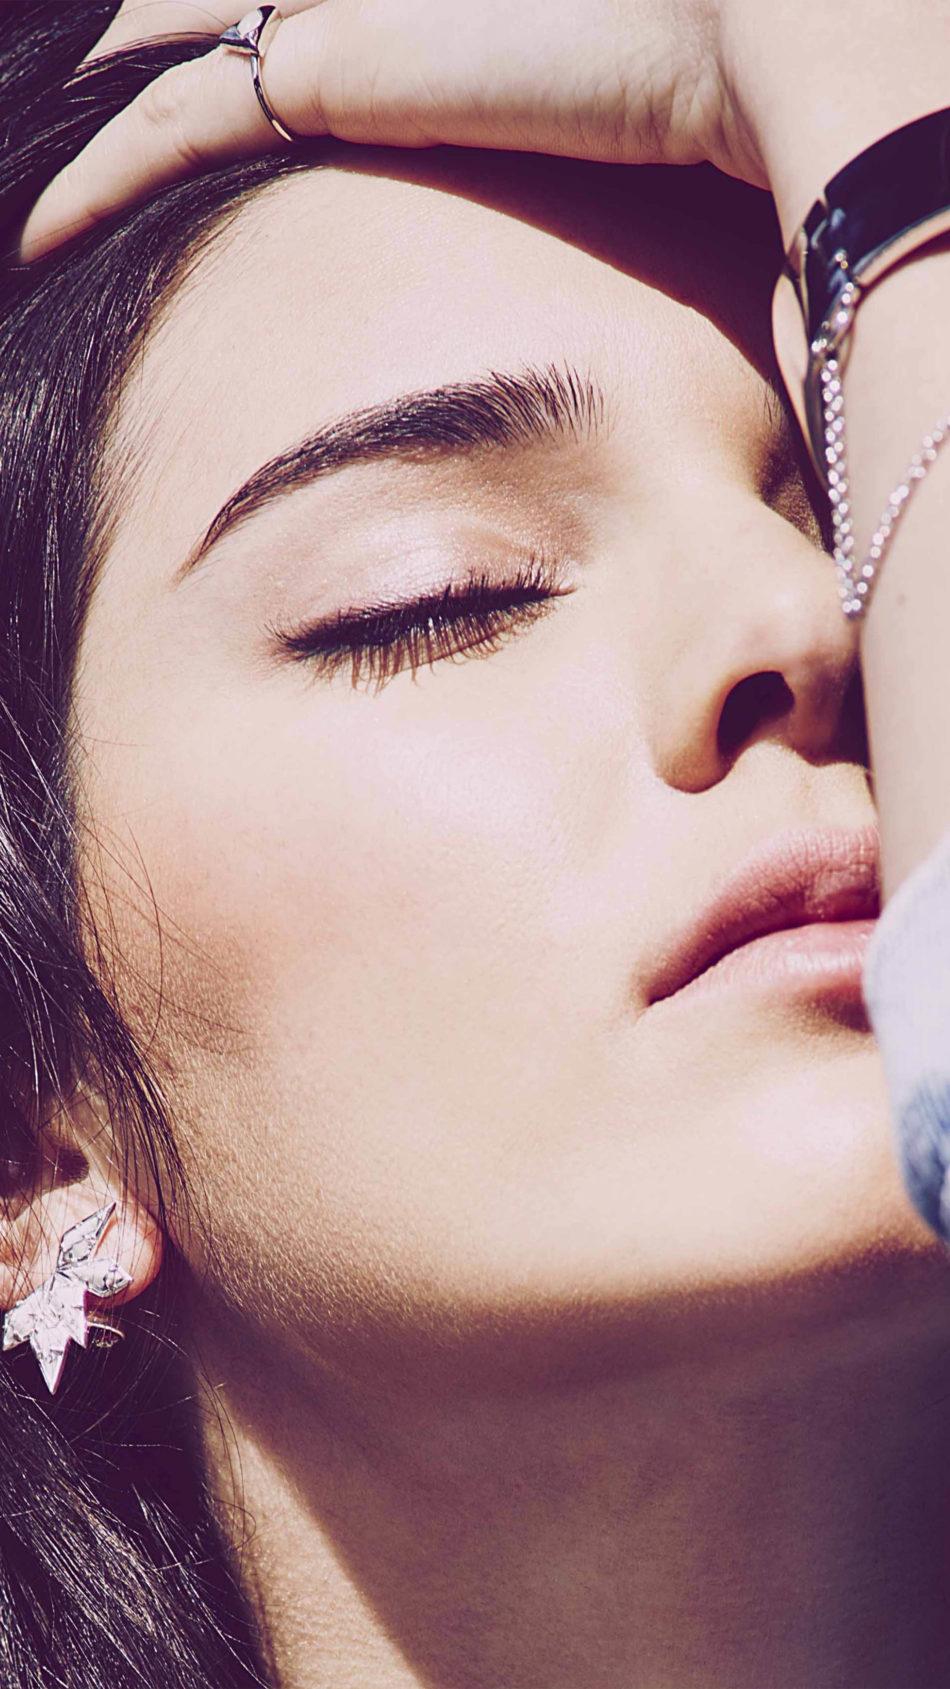 Kendall Jenner Close Up Face Sunlight 4K Ultra HD Mobile Wallpaper